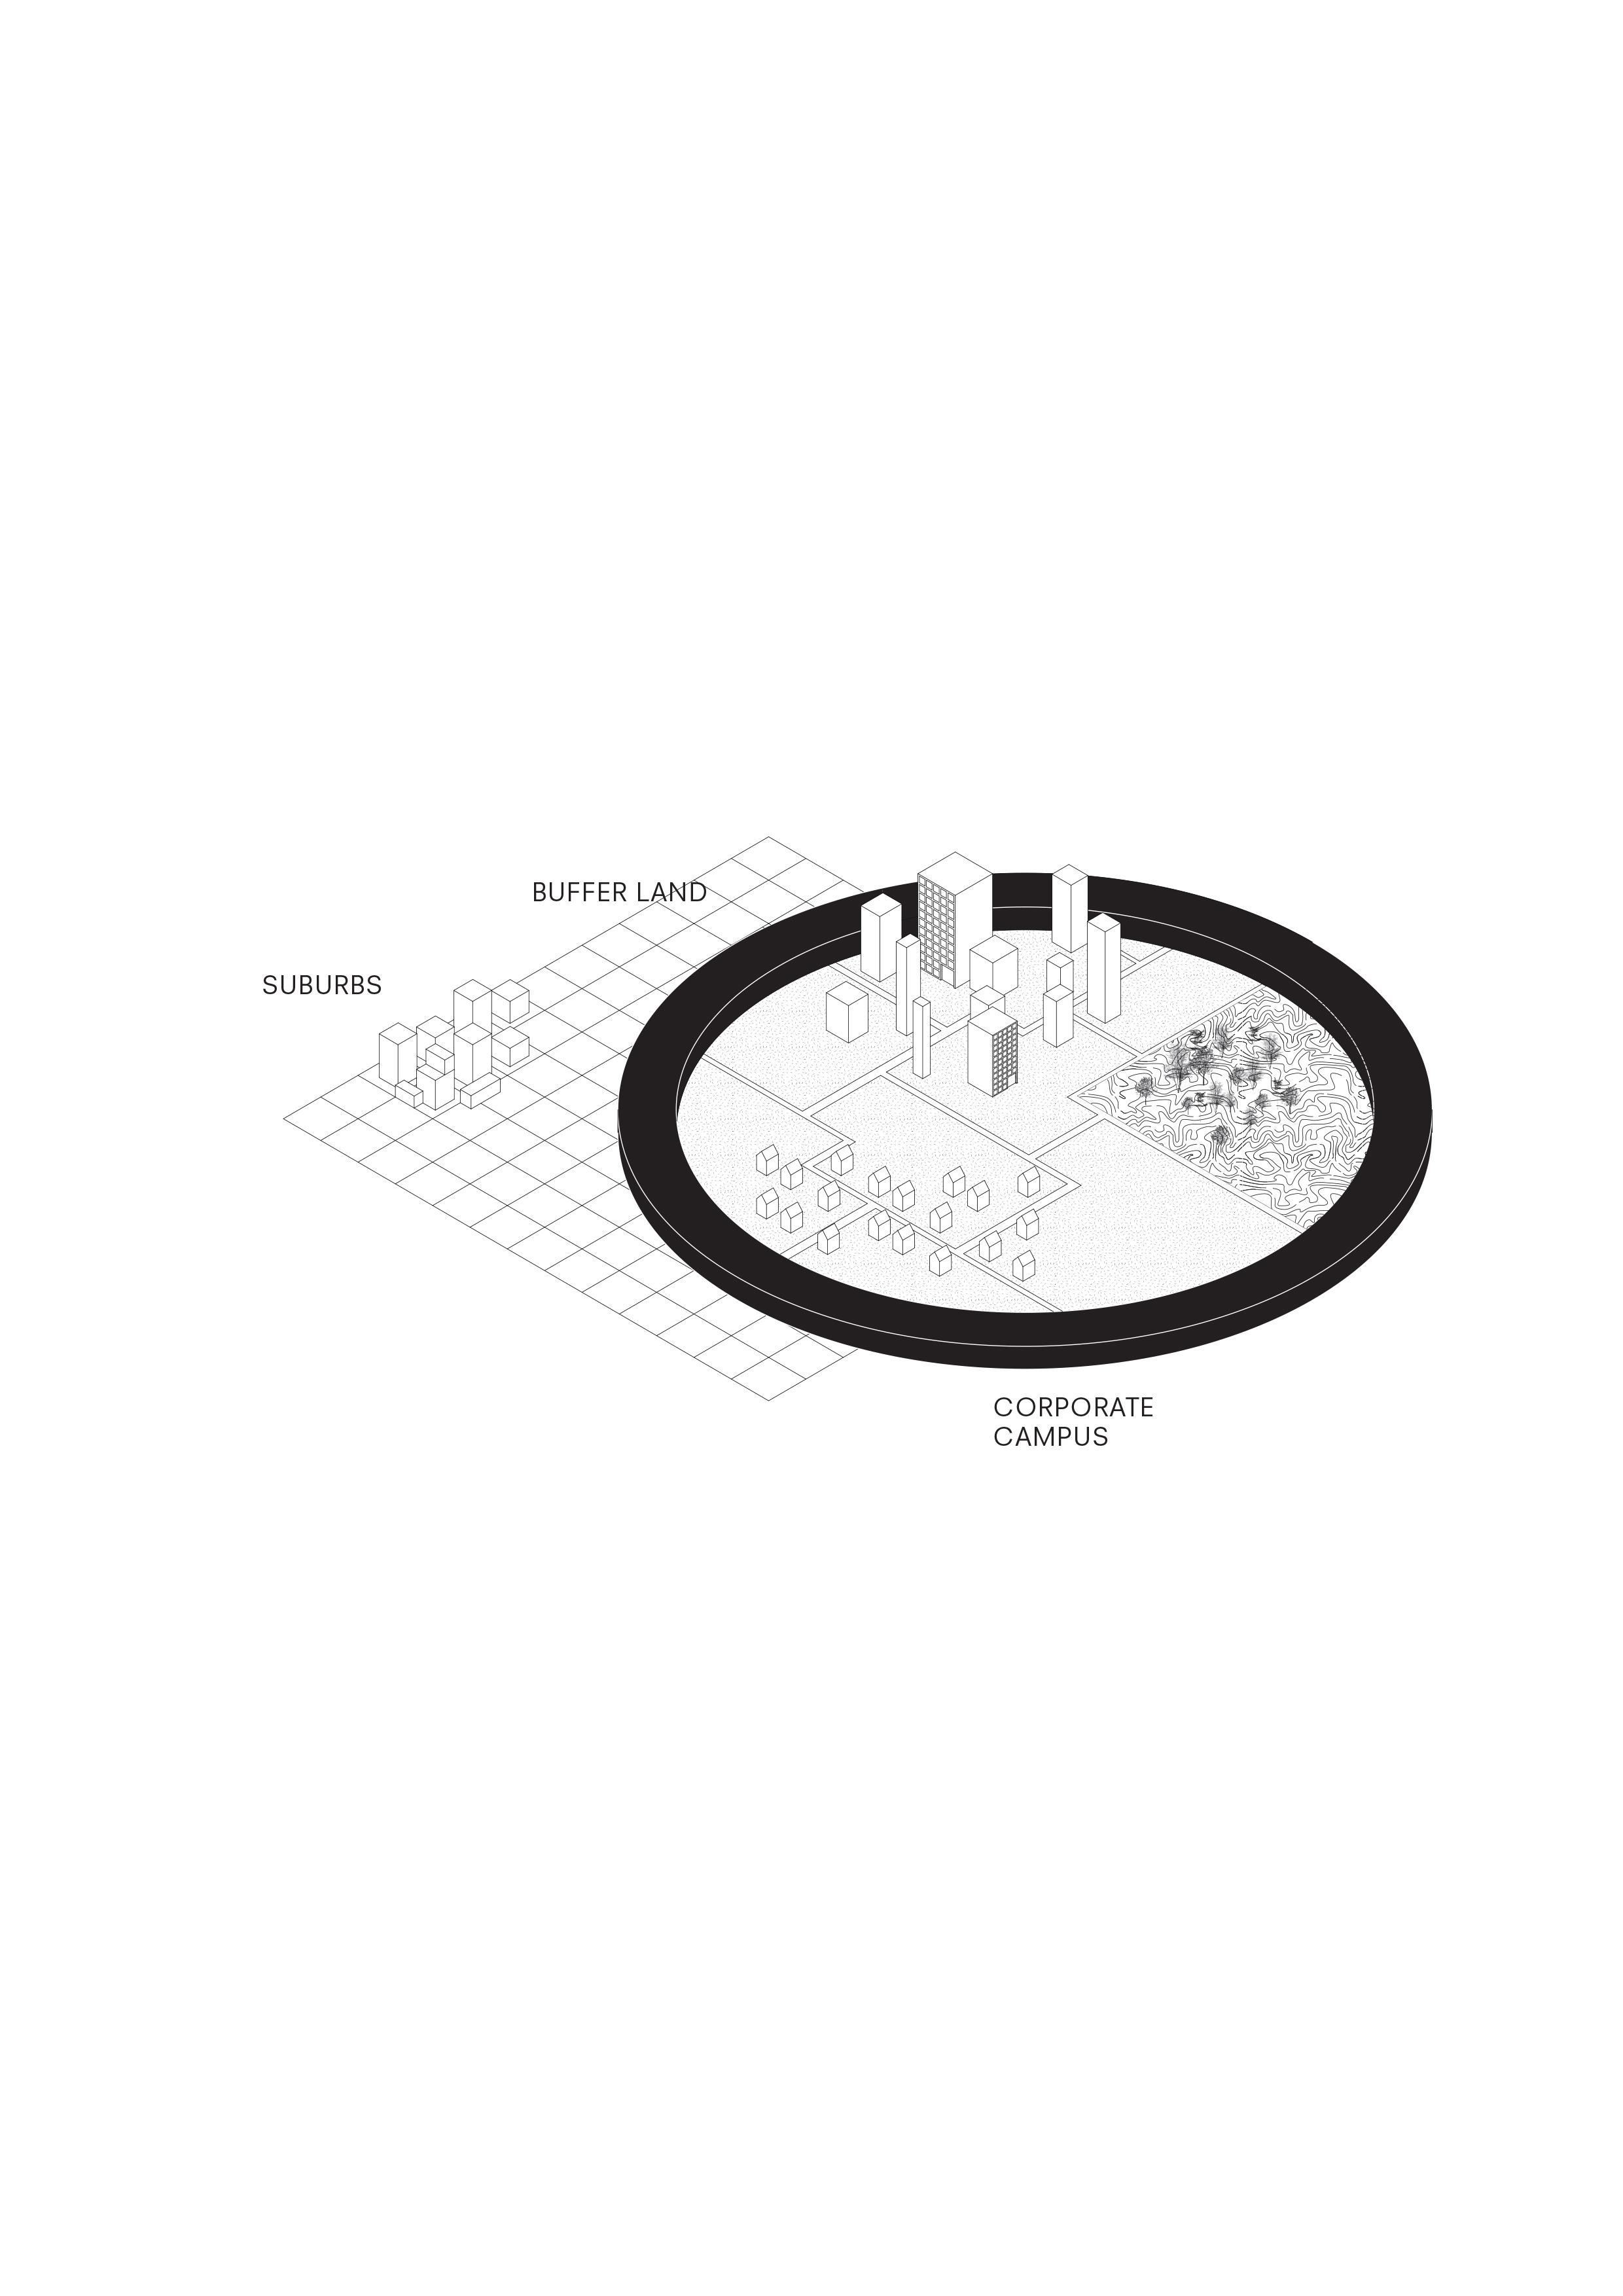 Diagram 3_Future Scenario or the City inside the Corporate Campus